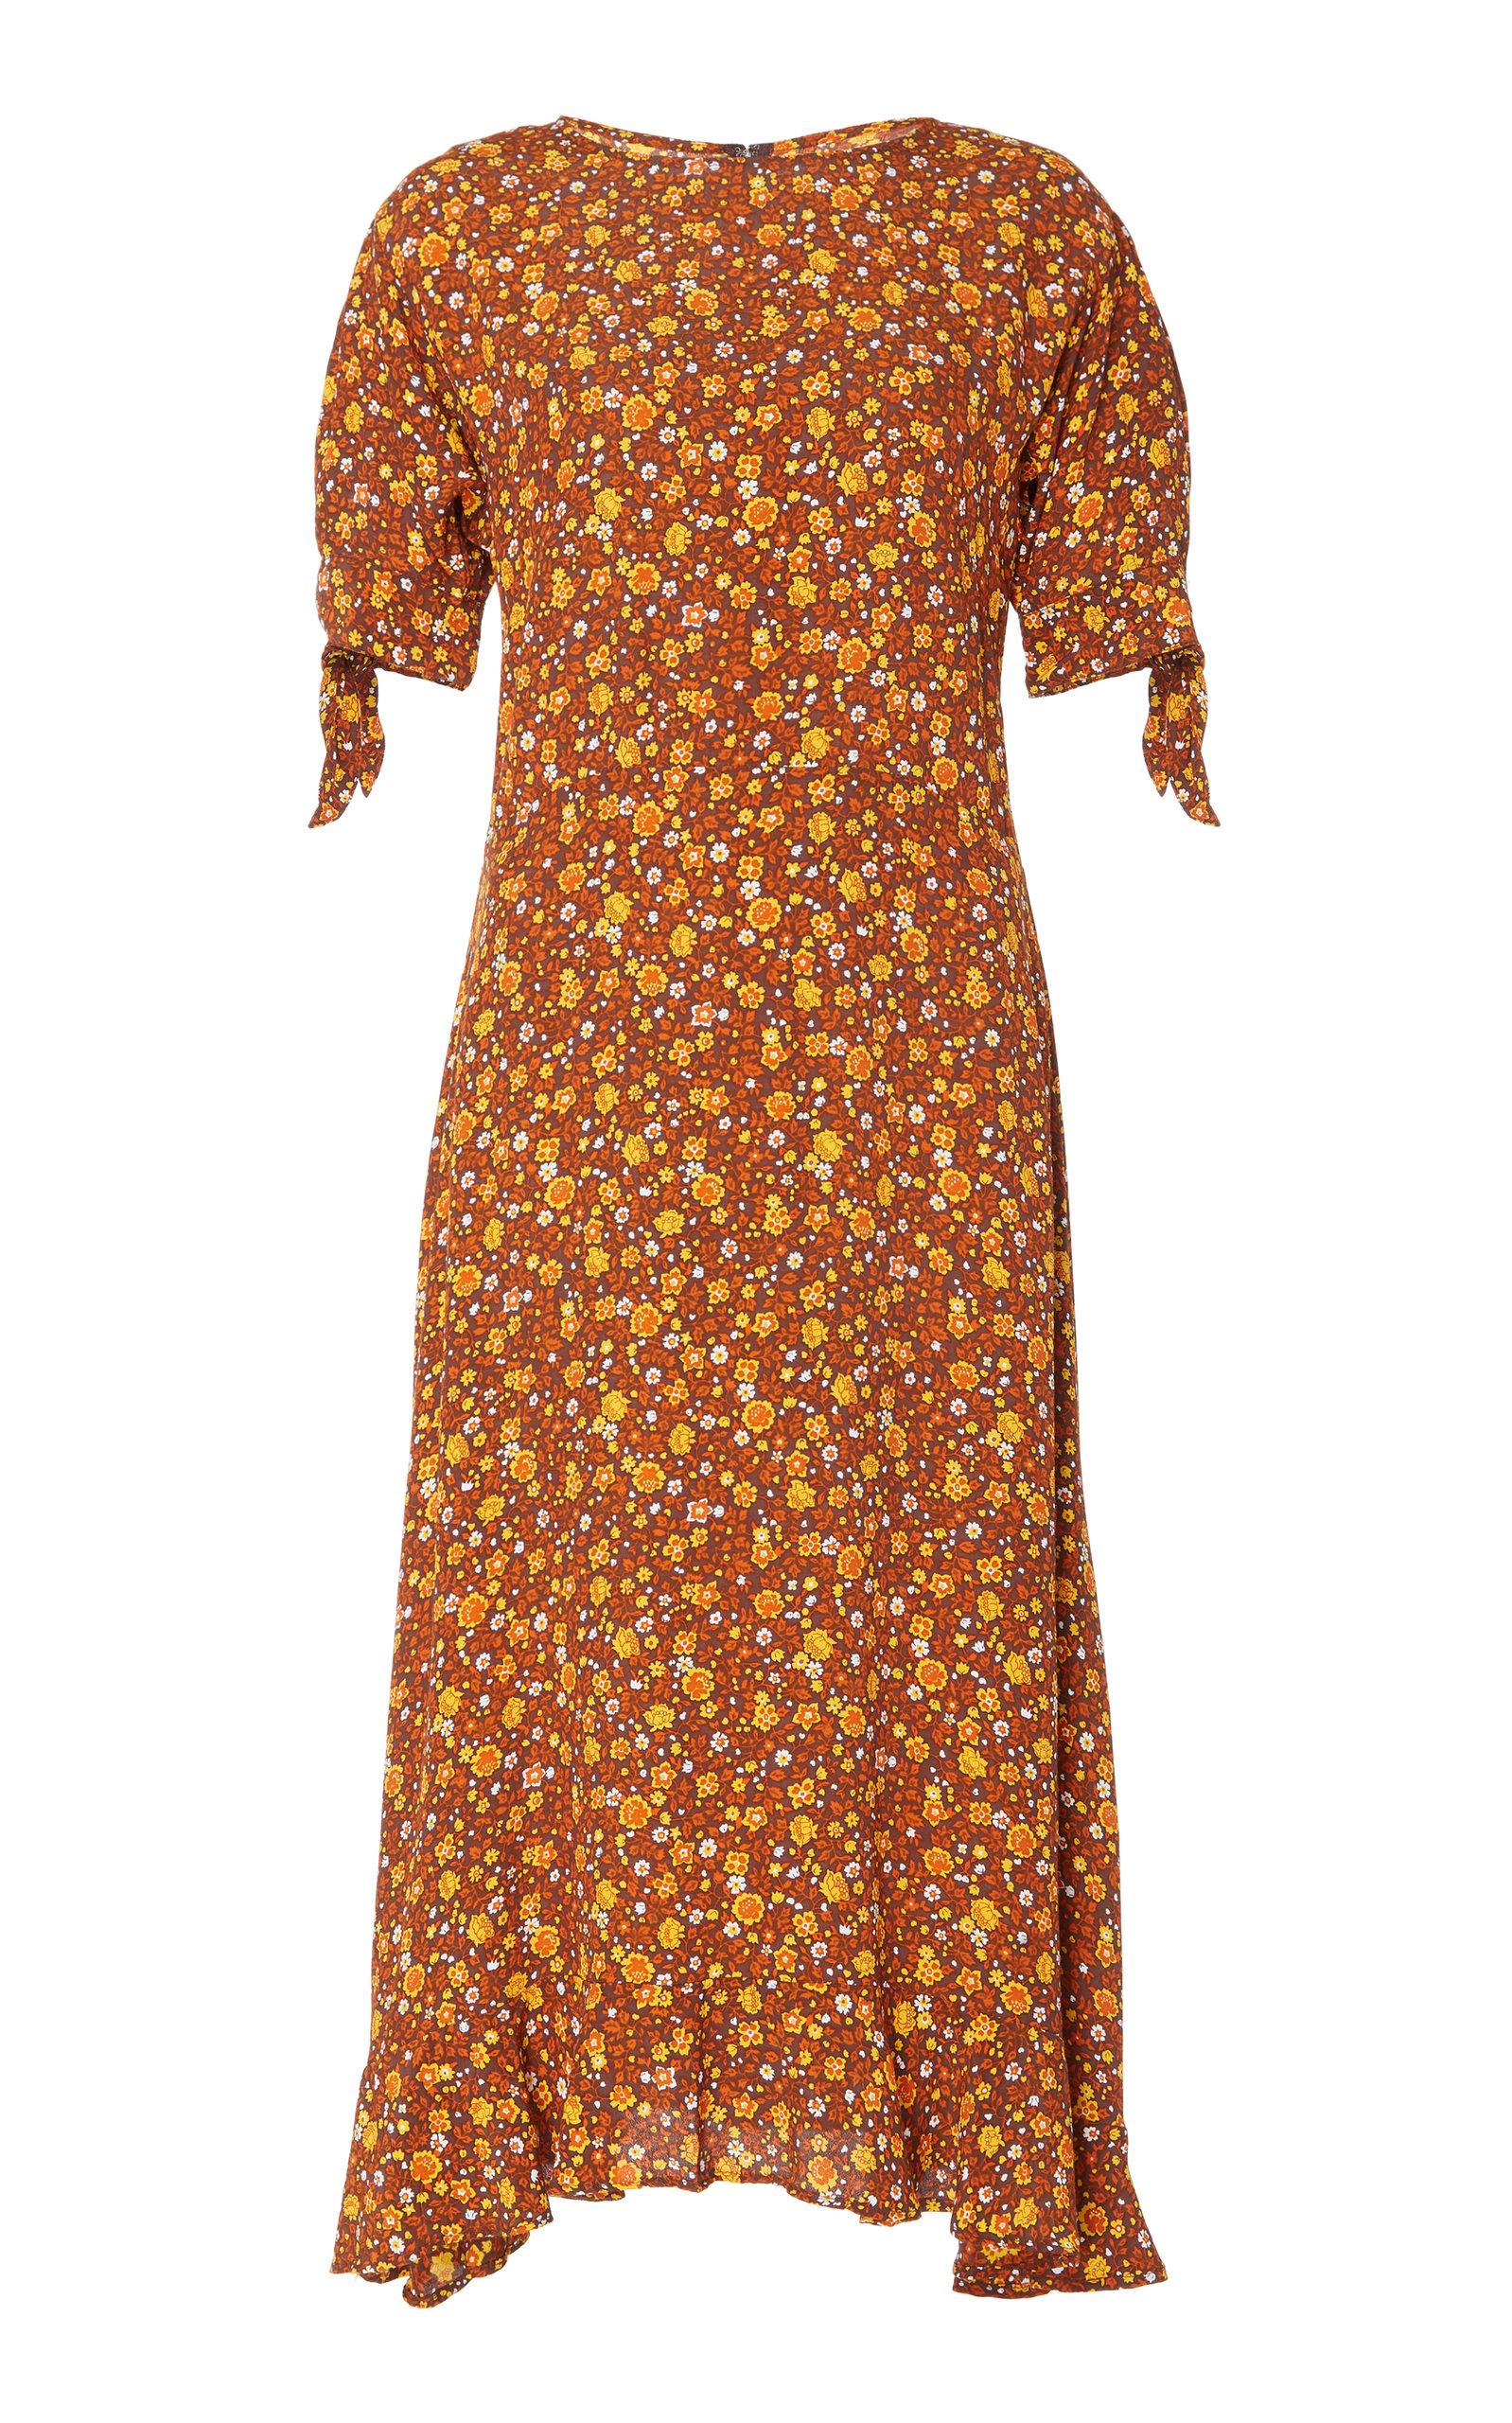 Emilia Floral Print Midi Dress by Faithfull The Brand